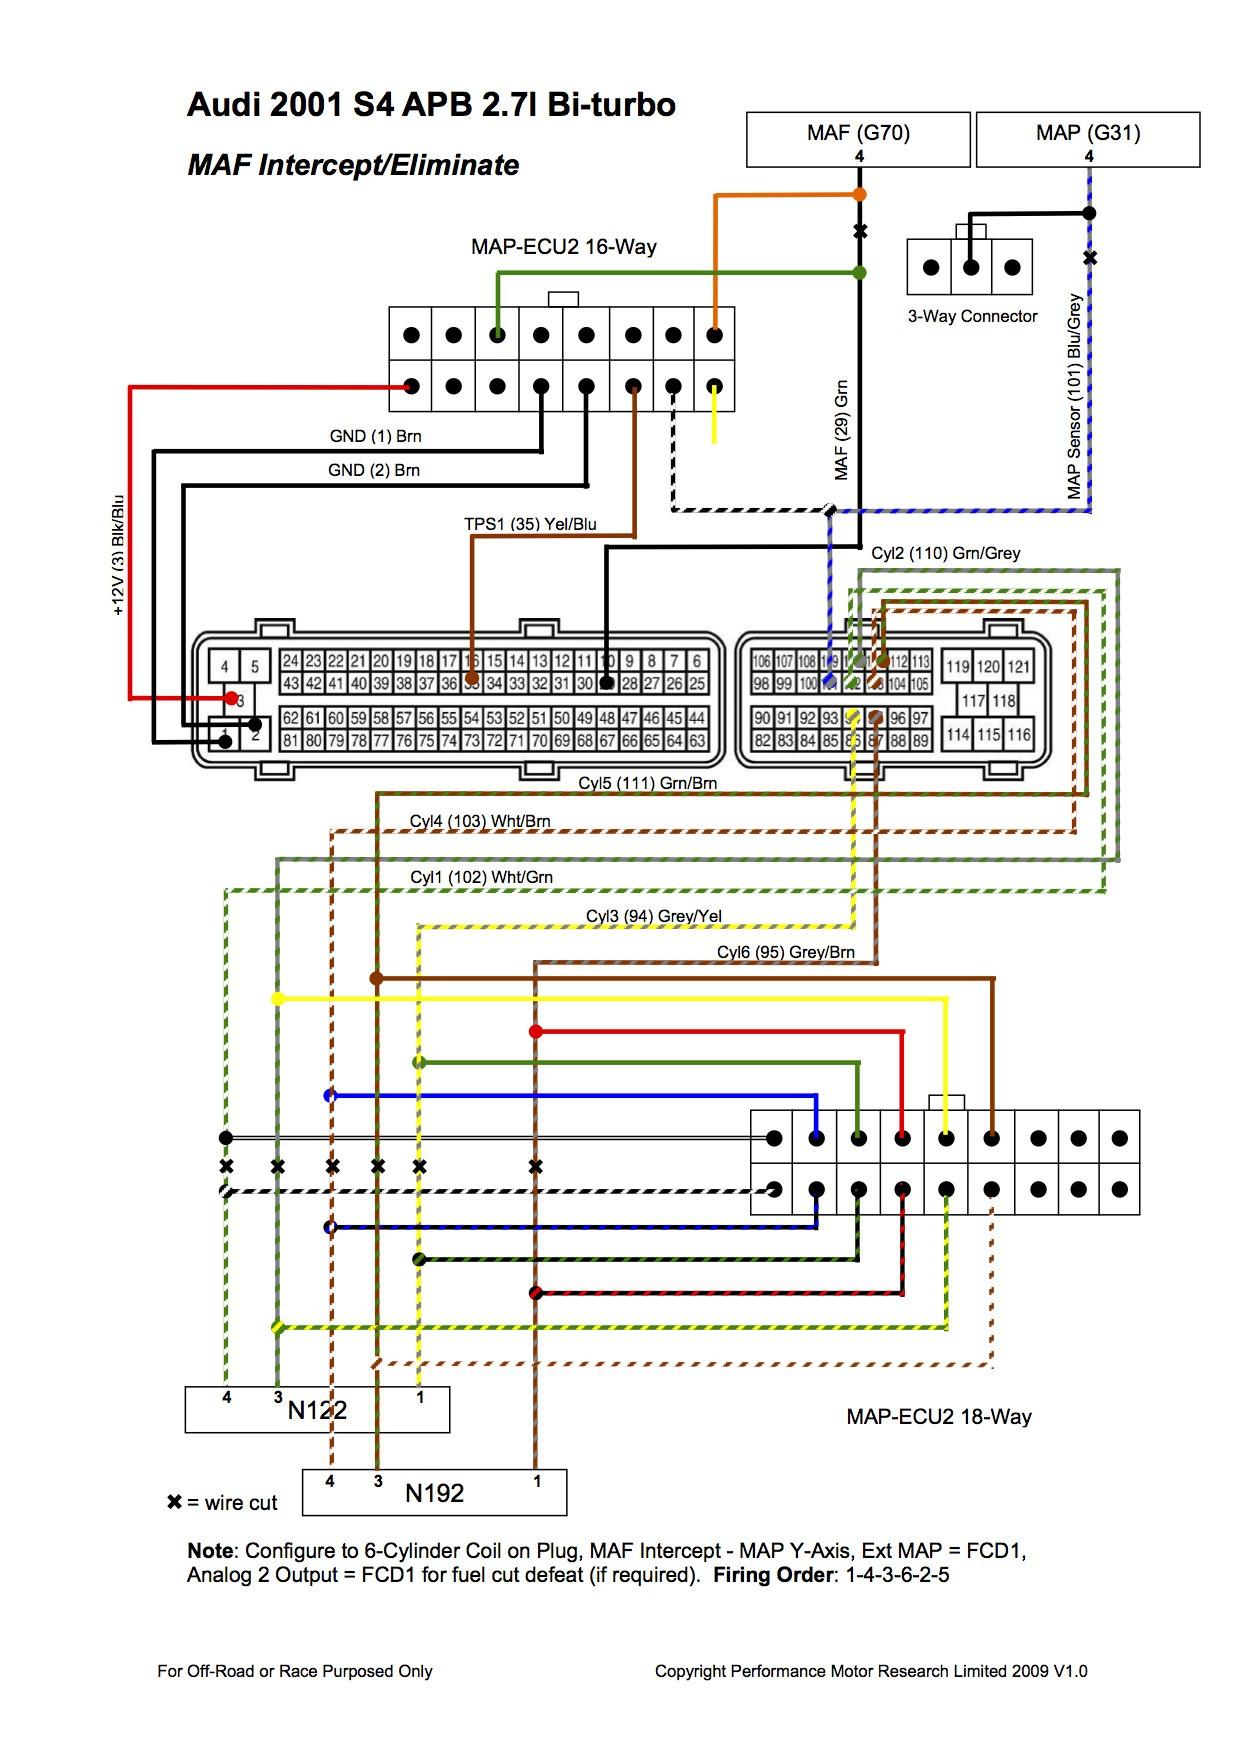 Wiring Diagram Maruti Alto CarWiring Diagram